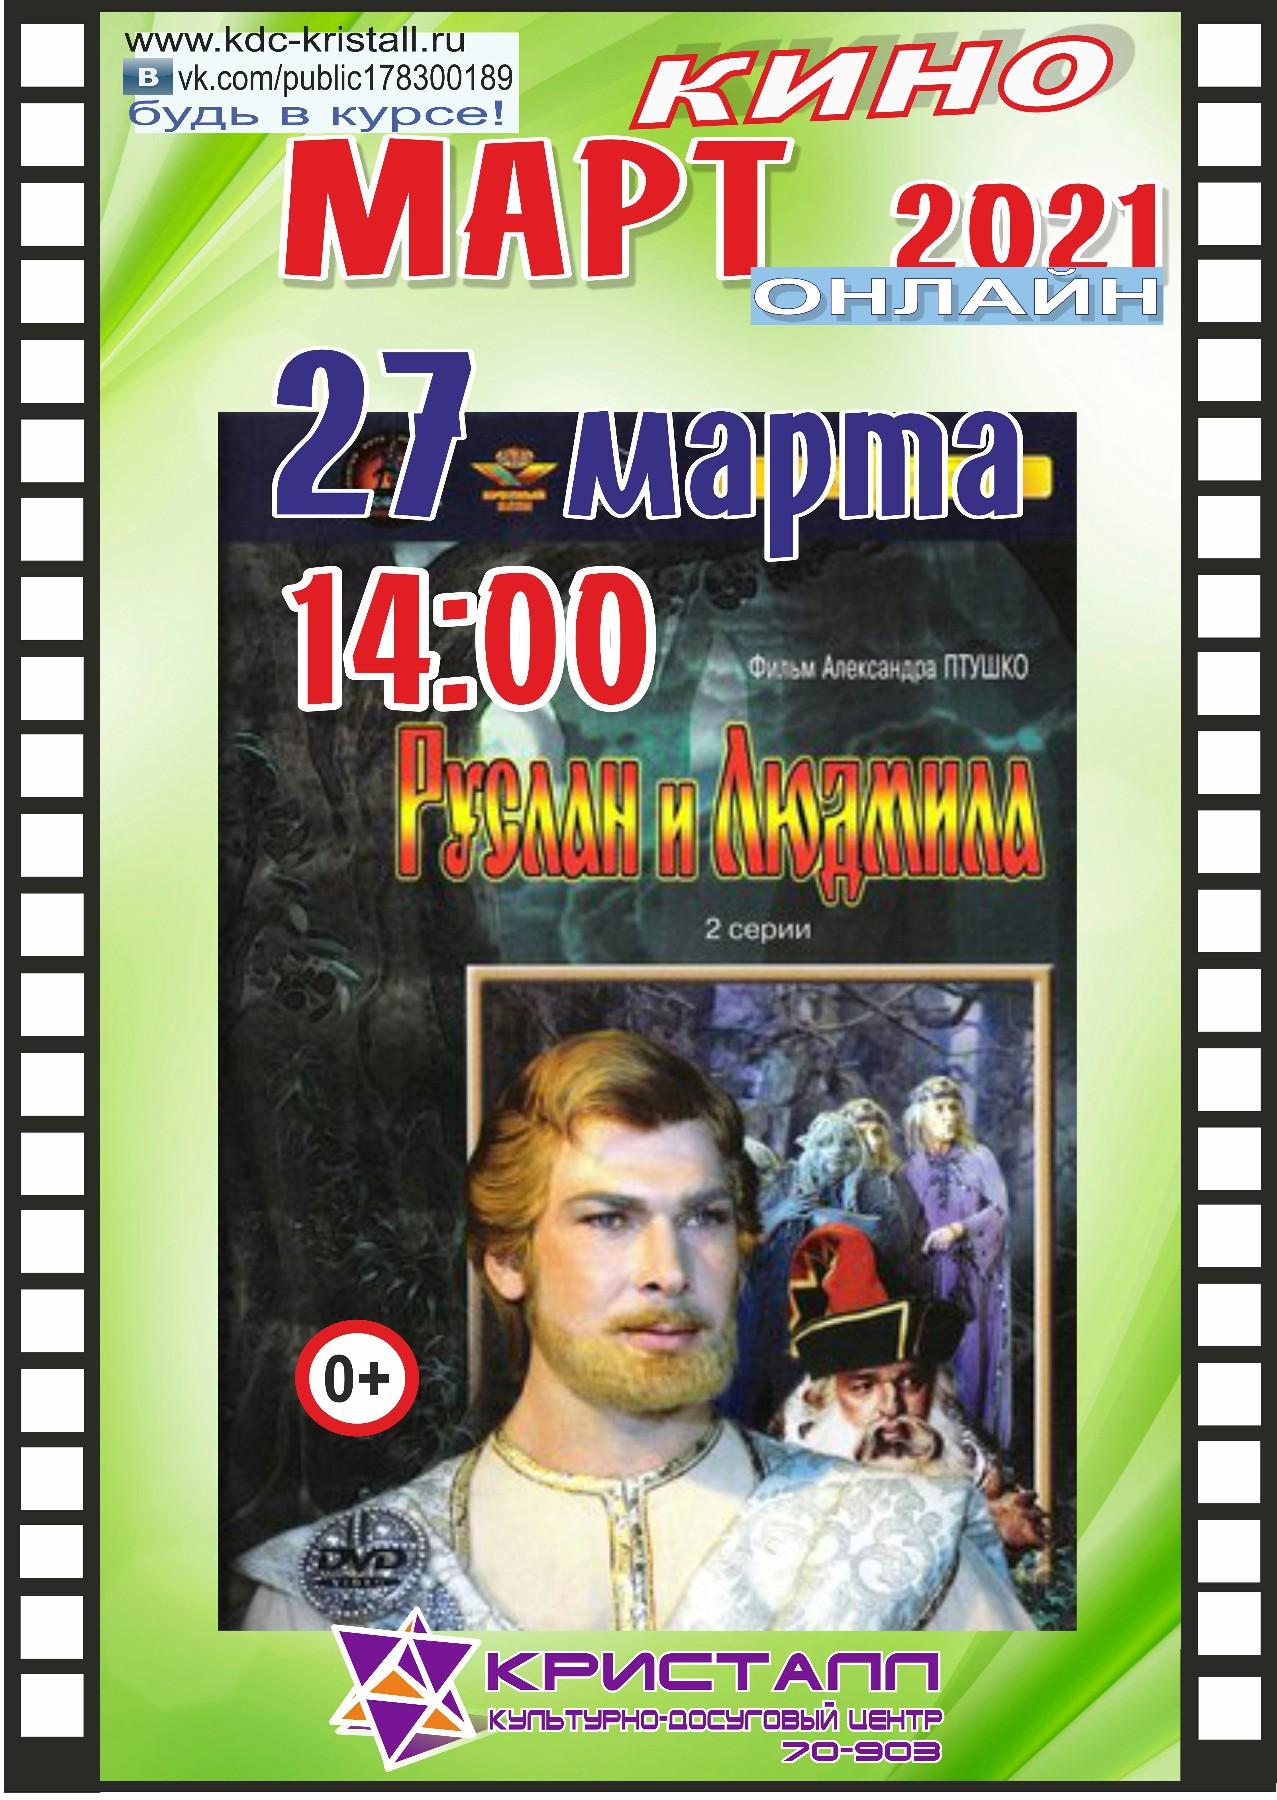 кино онлайн 2021